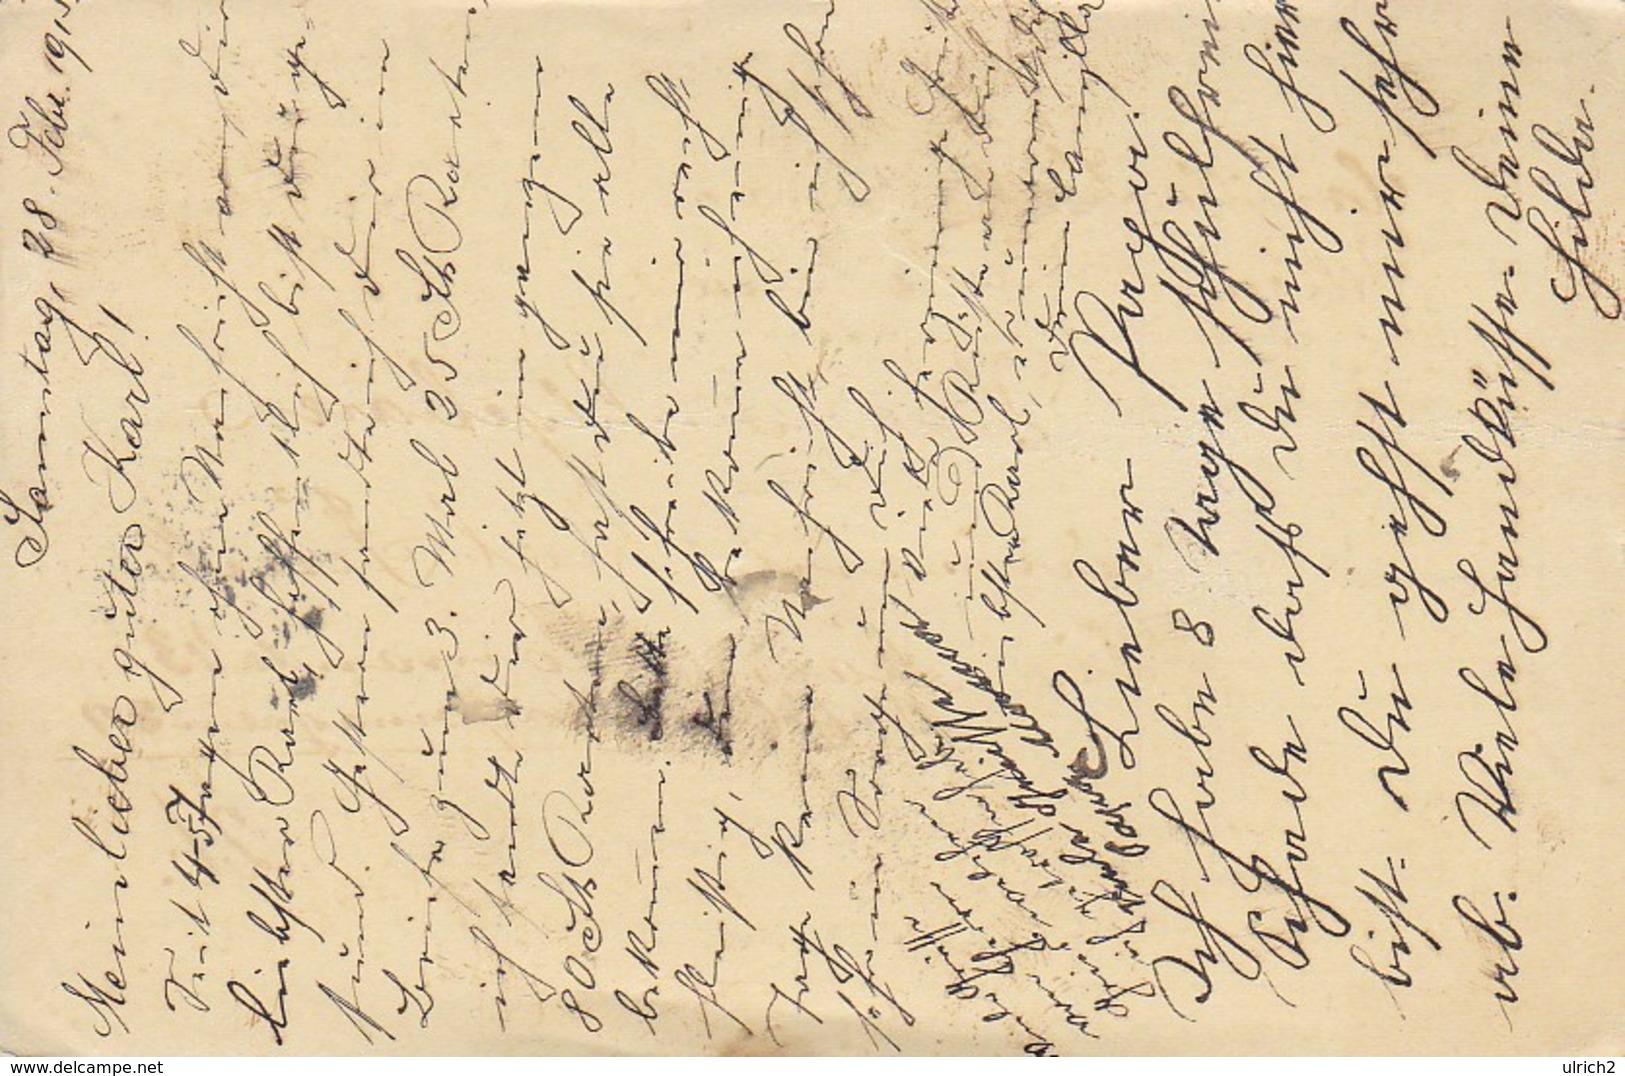 Feldpostkarte - Wien An Div-Train-Kommando 43 - 1915 (39315) - Briefe U. Dokumente